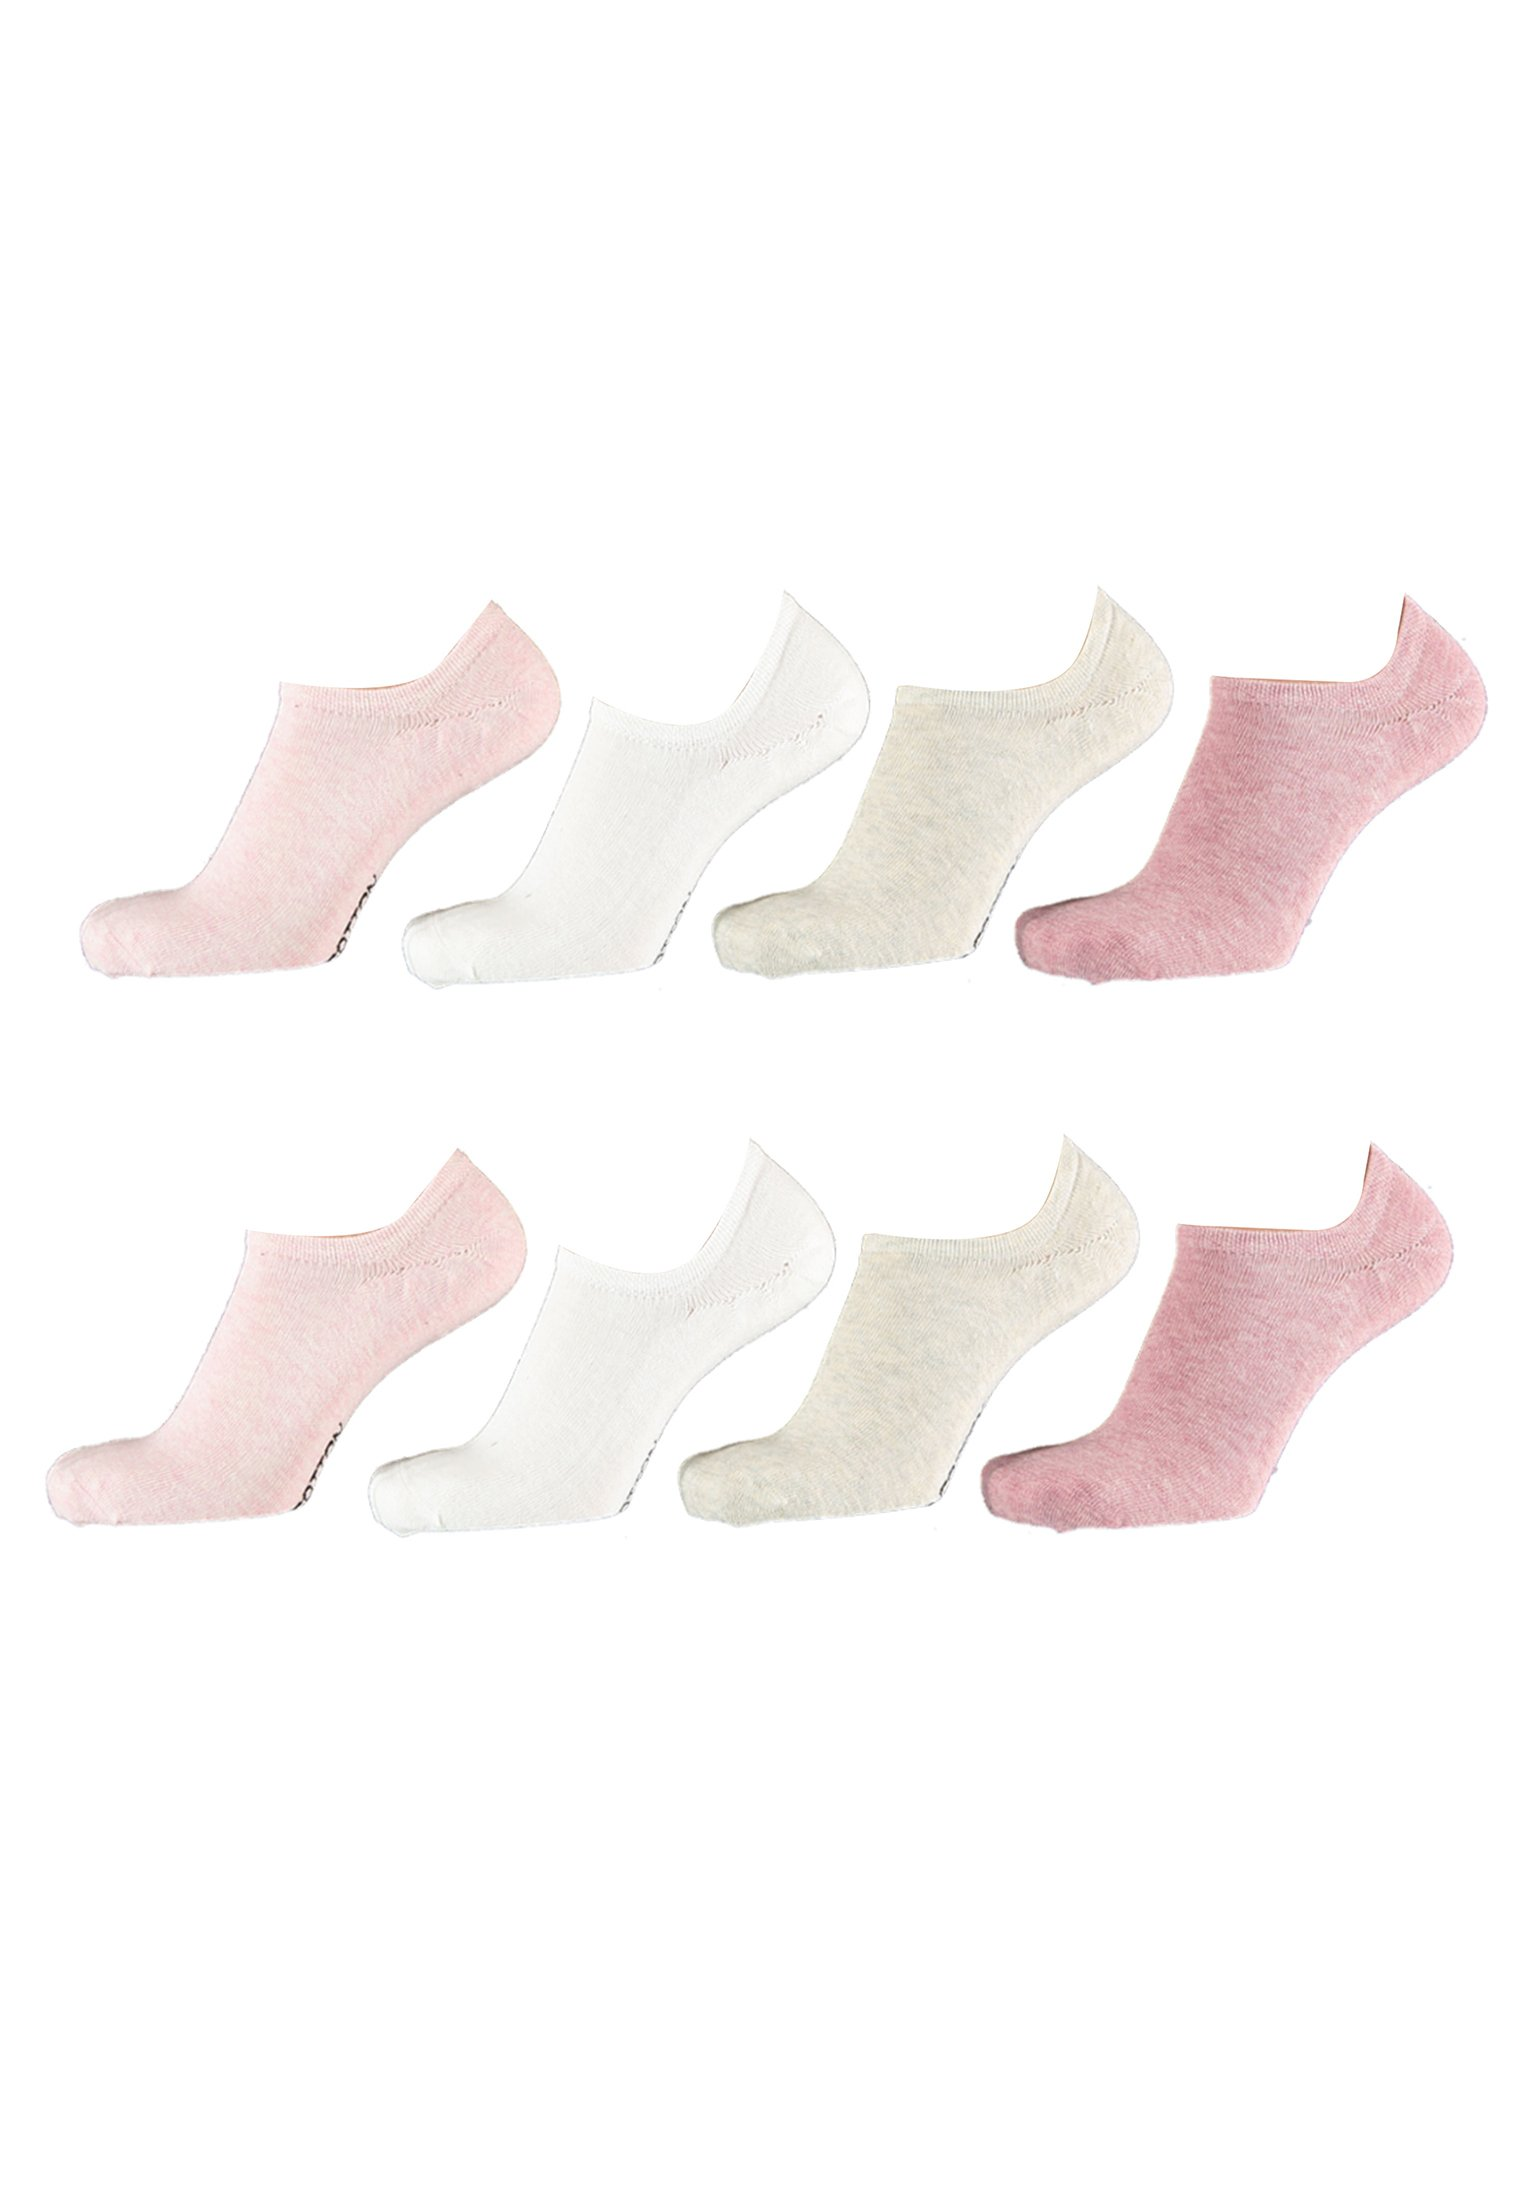 Femme 8 PACKS - Chaussettes